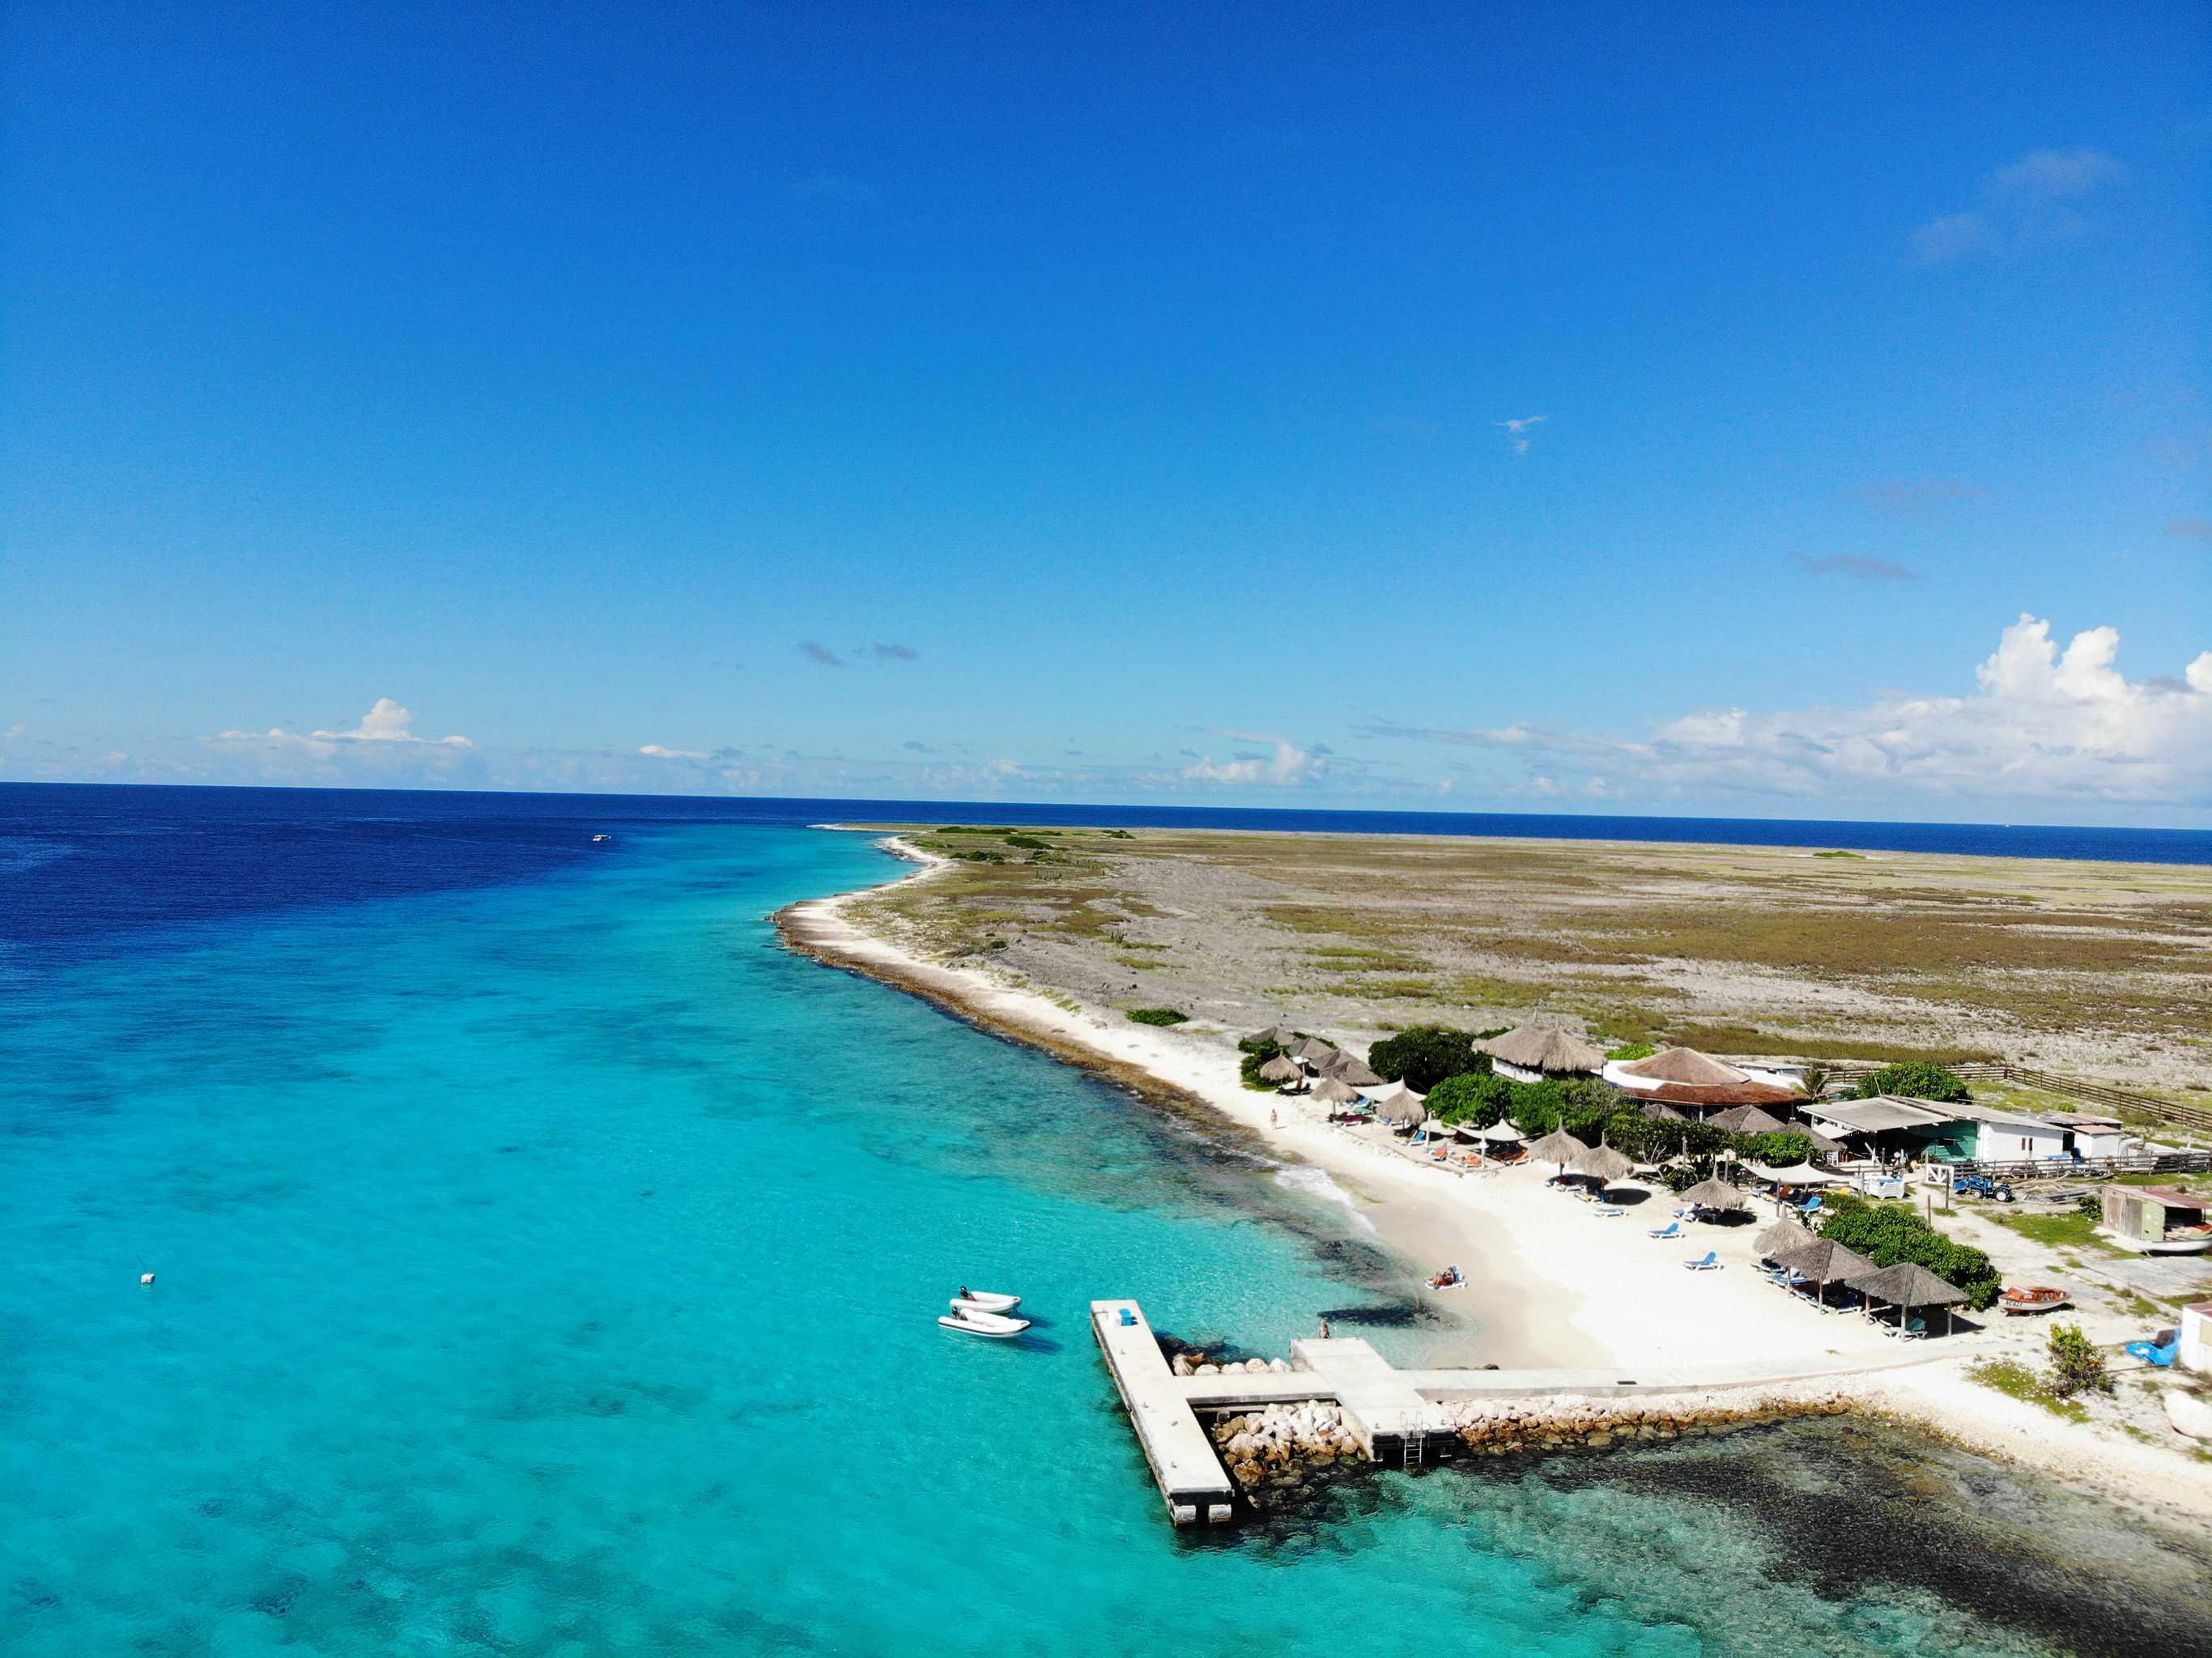 Boat trip to Klein Curaçao Miss Ann 2